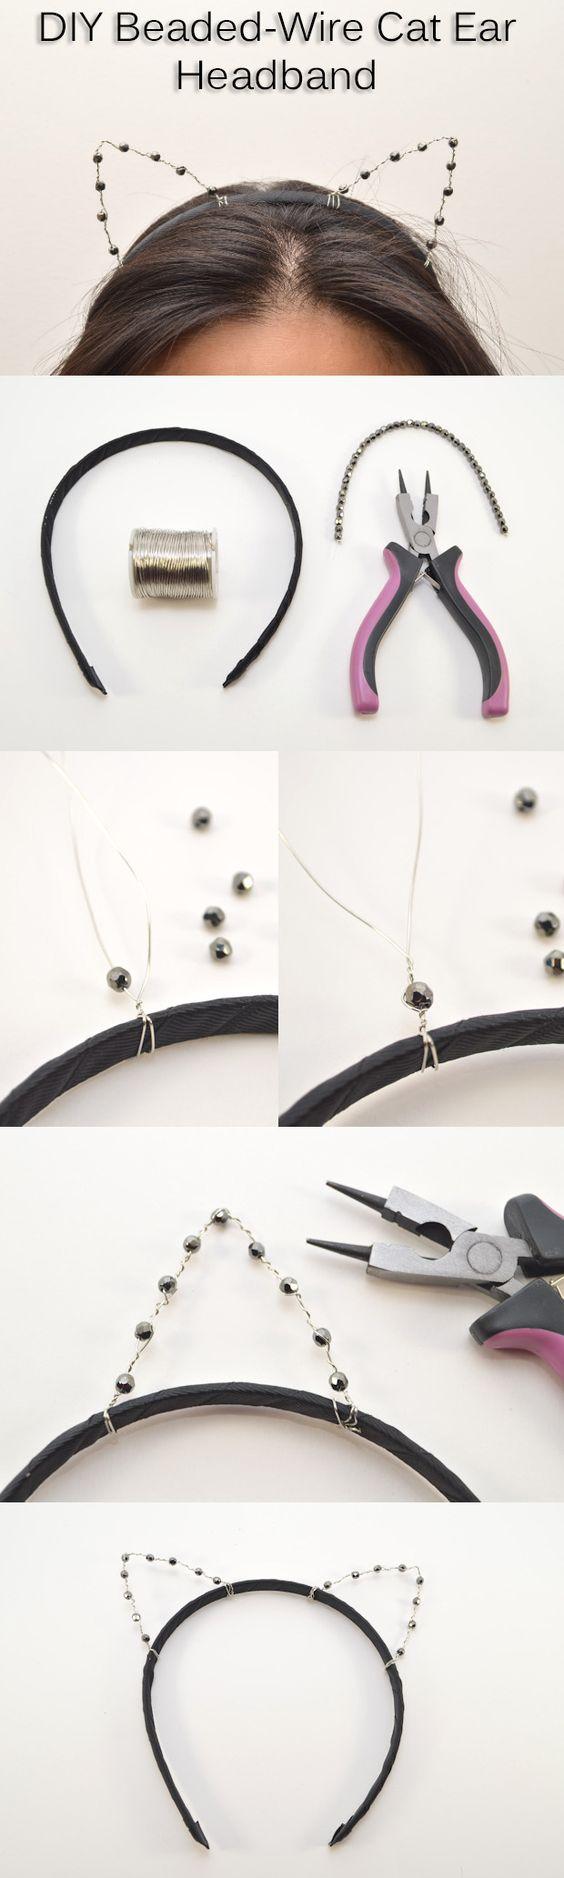 Beaded-Wire Cat Ear Headband for DIY Cat Costume.